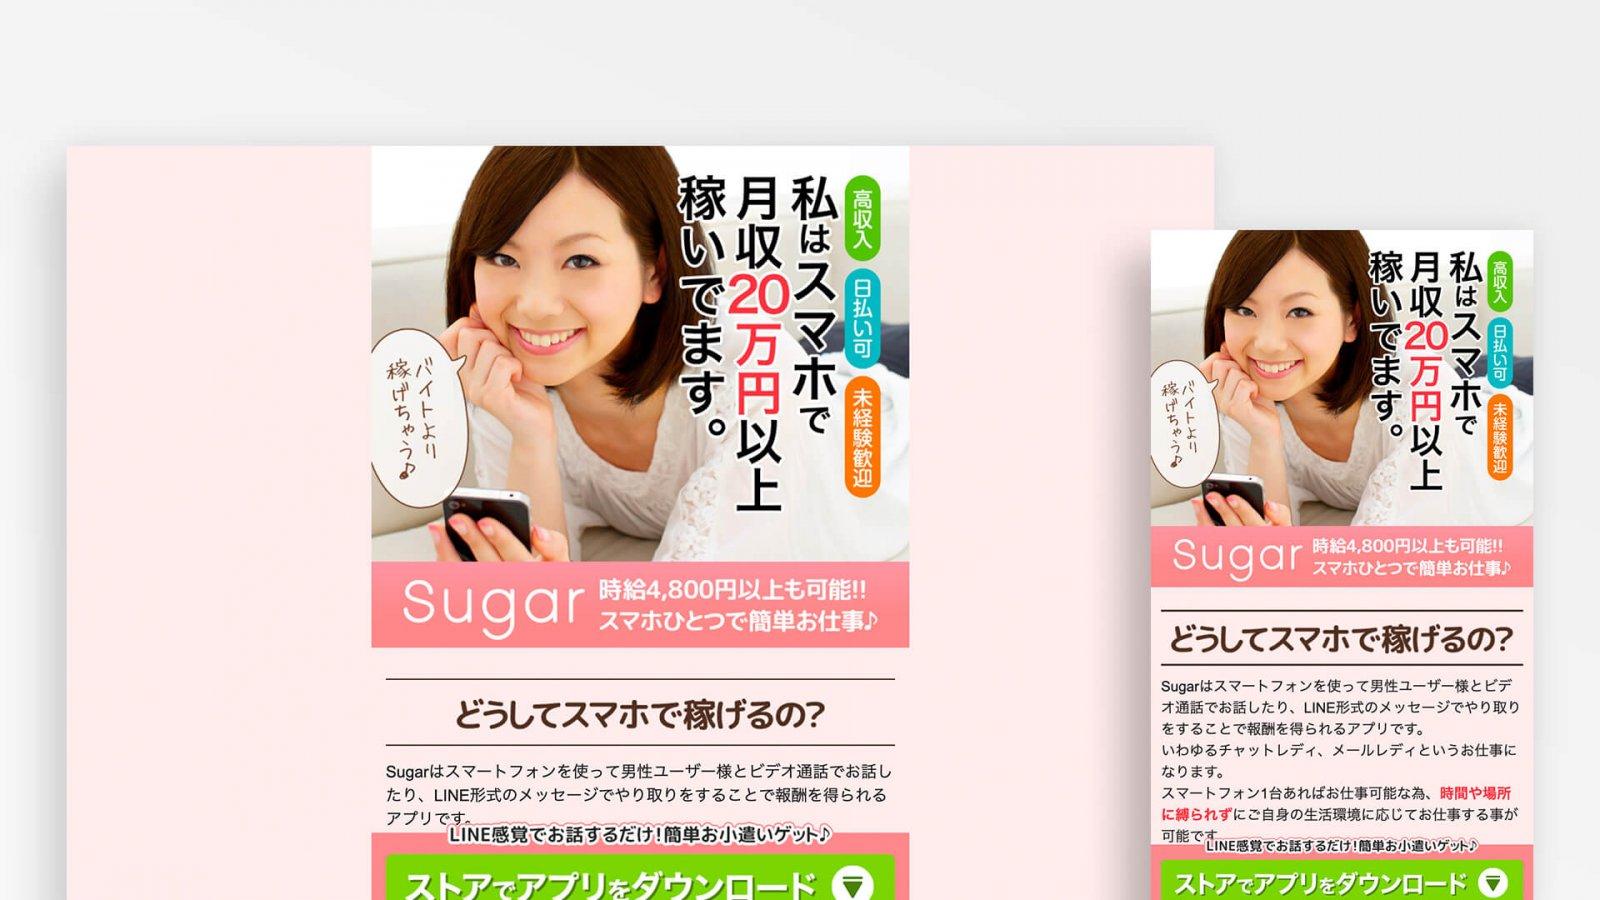 Sugarサイトキャプチャ